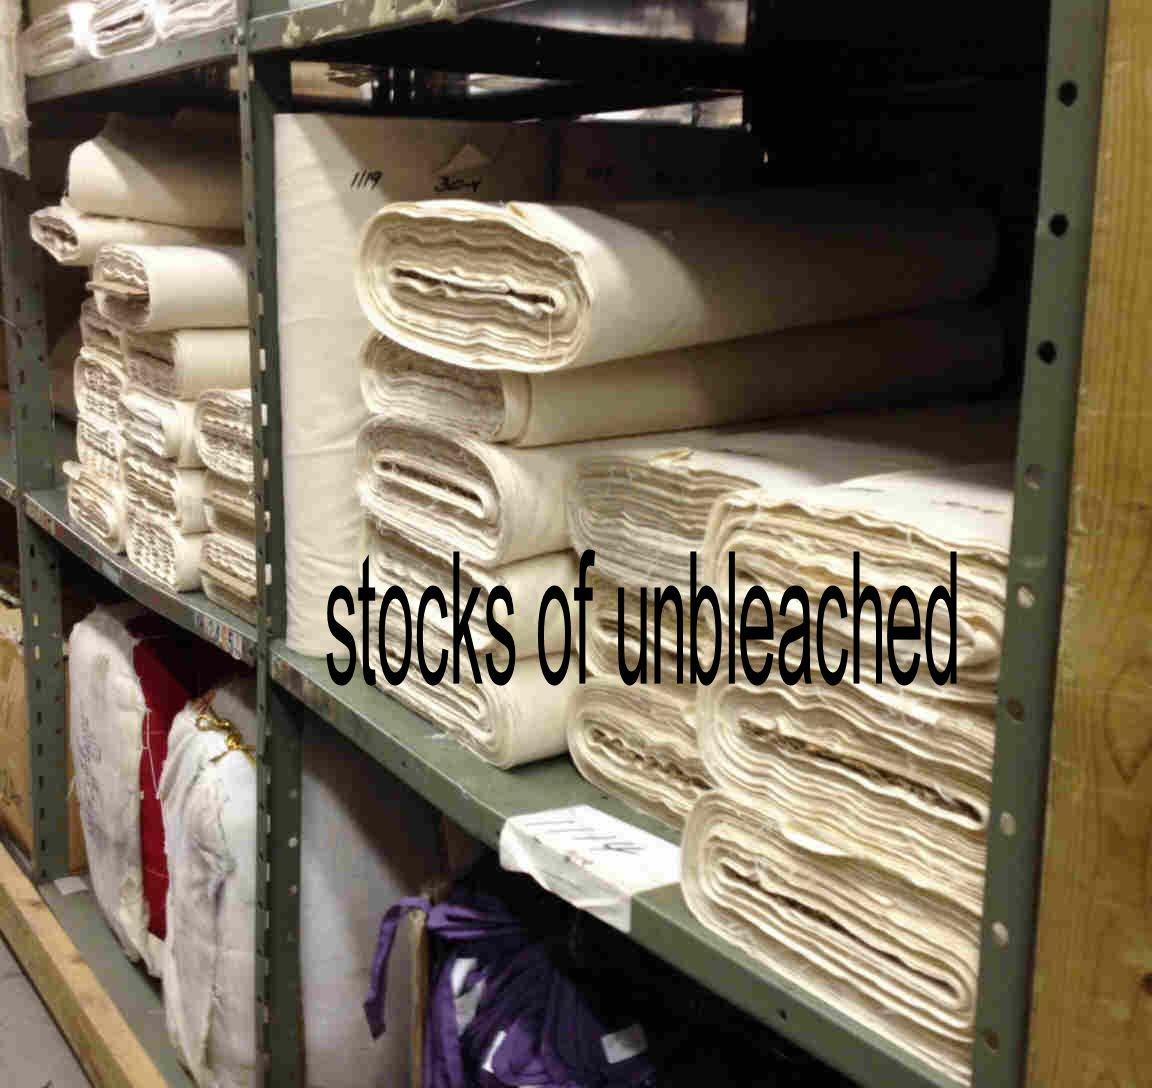 #1114 5 Yards 38 Unbleached Cotton